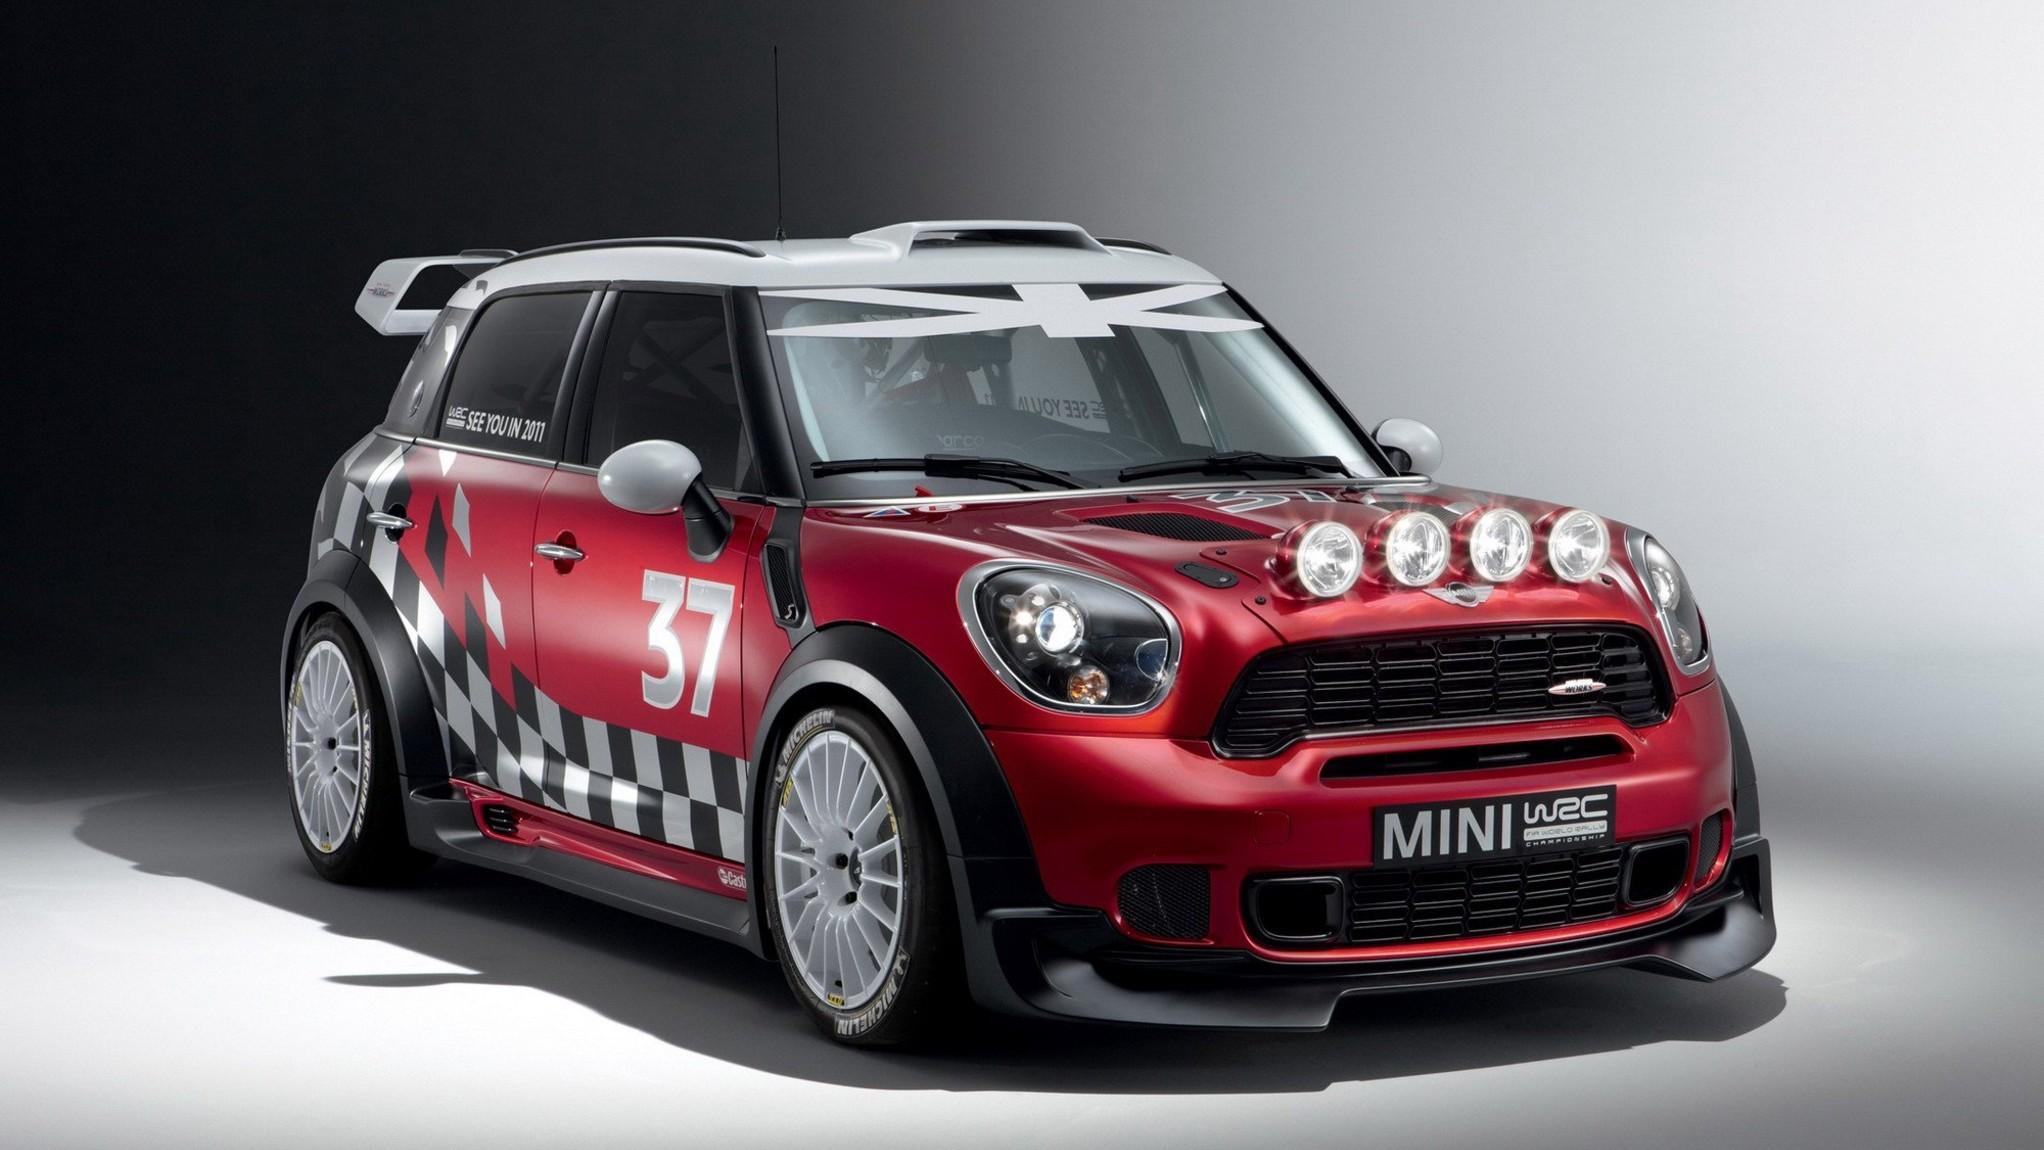 2010 MINI Countryman Rally Edition (1)